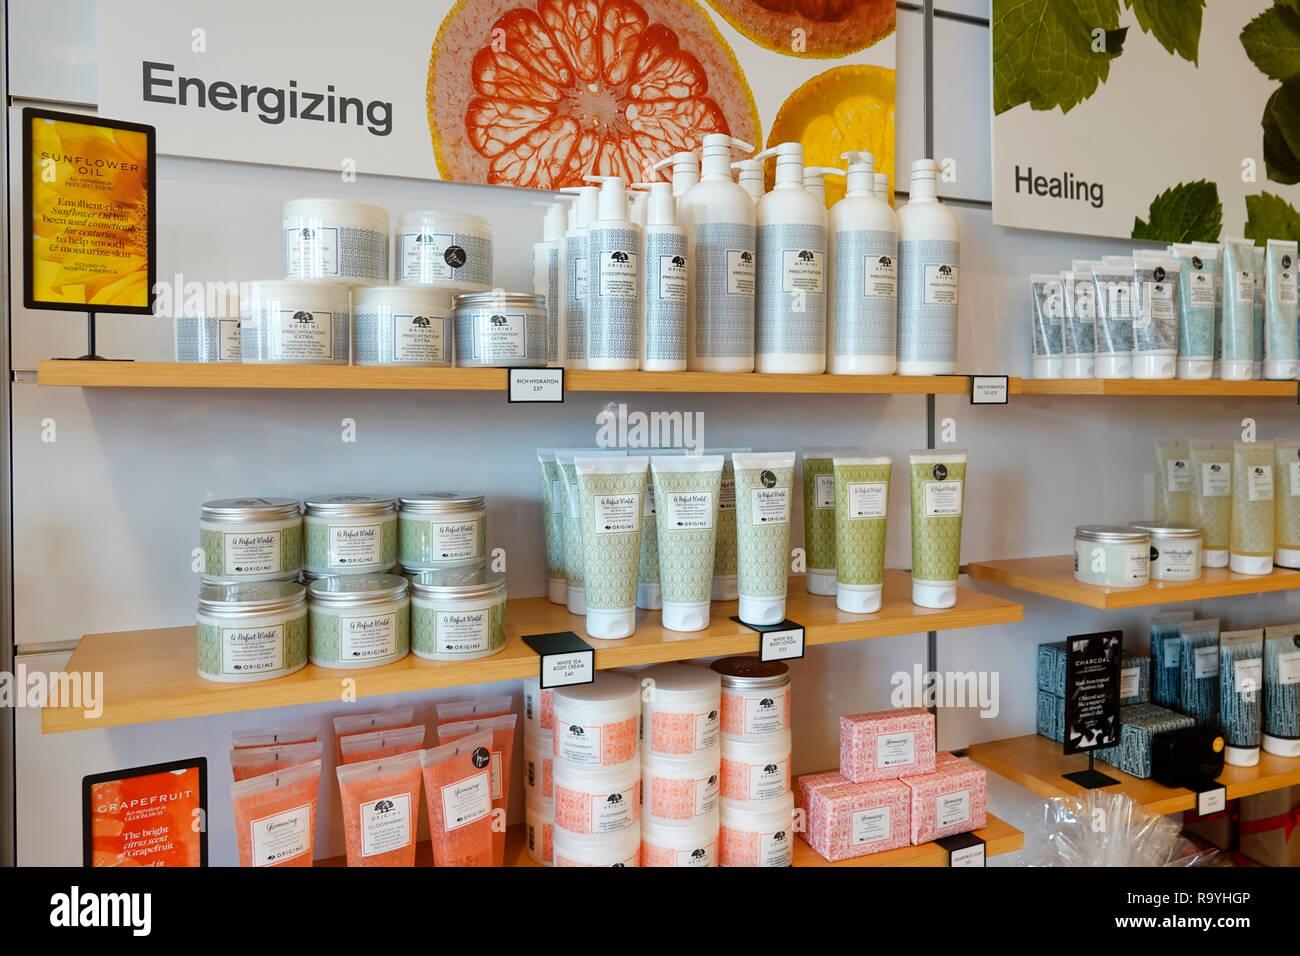 Fort Ft. Lauderdale Florida Pembroke Pines Geschäfte am Pembroke Gardens Mall Shopping Ursprung Kosmetik Schönheit Produkte Skincare innen Anzeige Verkauf Stockbild